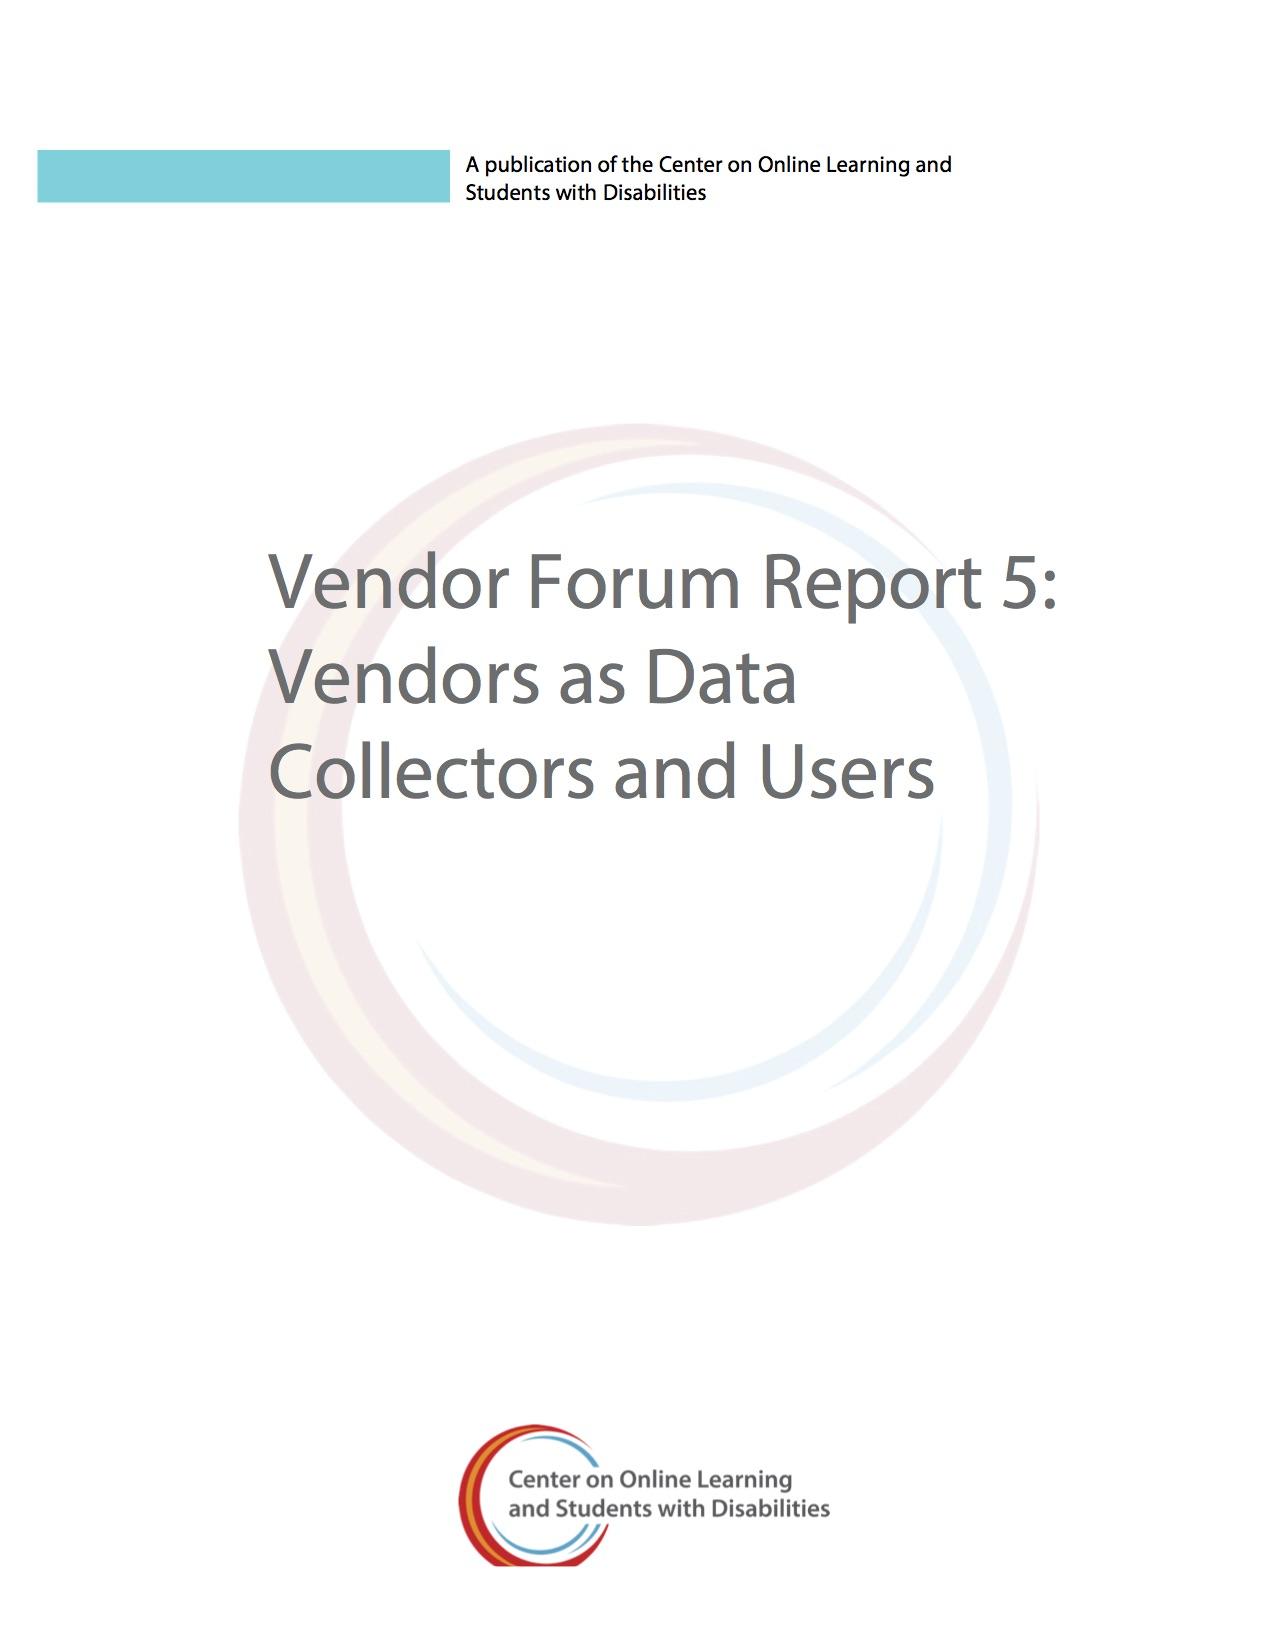 Vendor Forum Report 5: Vendors As Data Collectors And Users